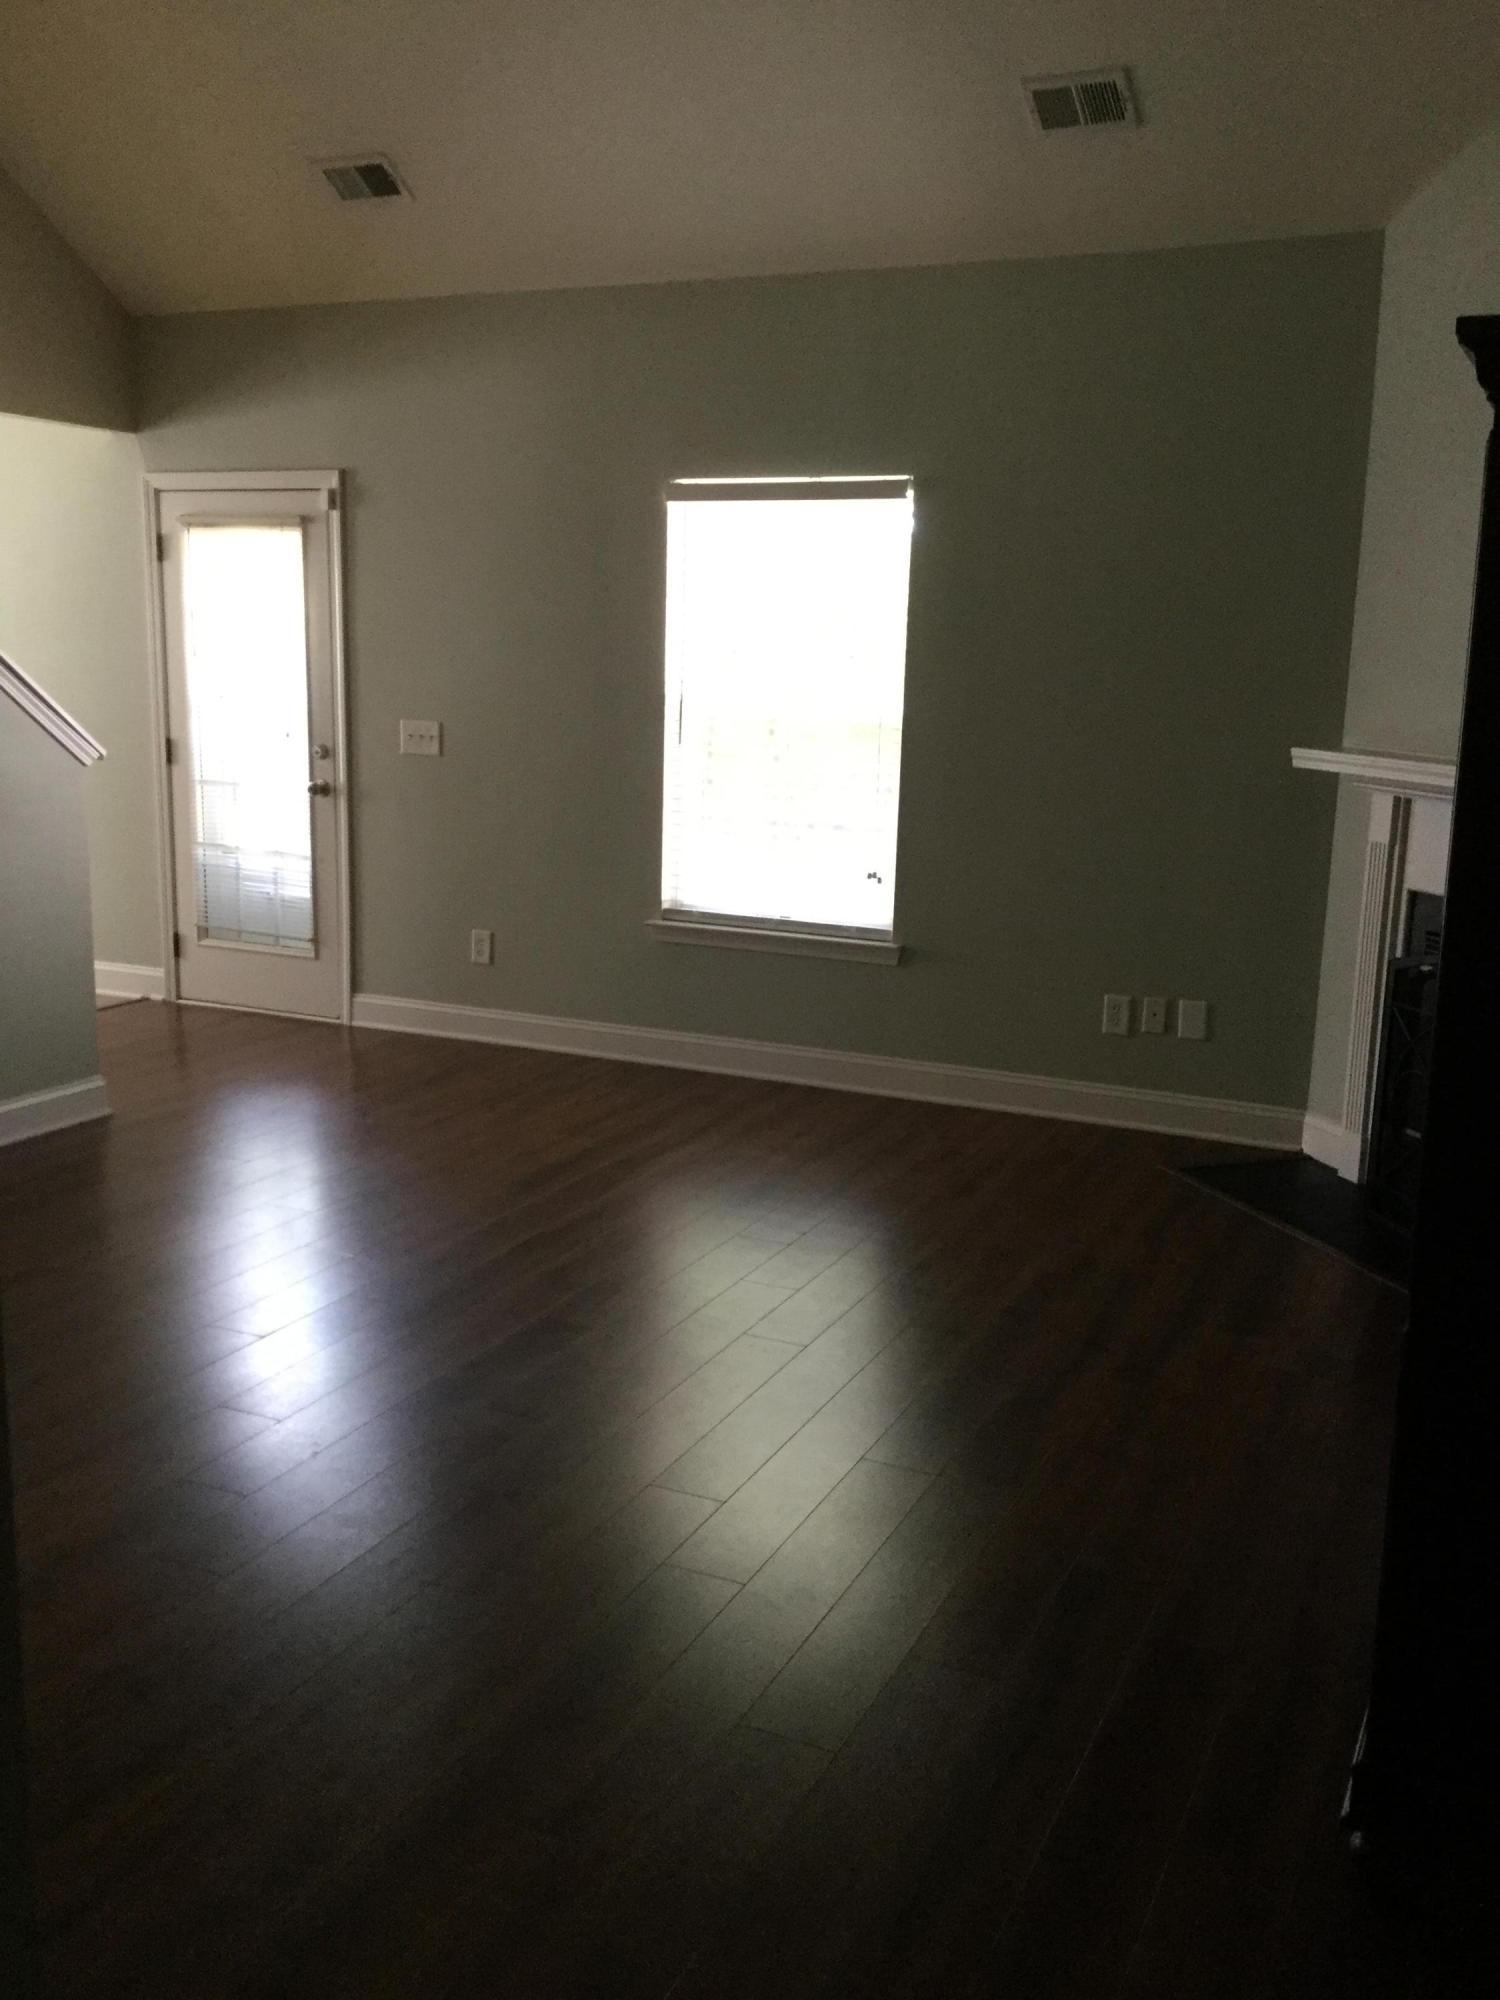 Kennsington Homes For Sale - 122 Heatherlock, Hanahan, SC - 5